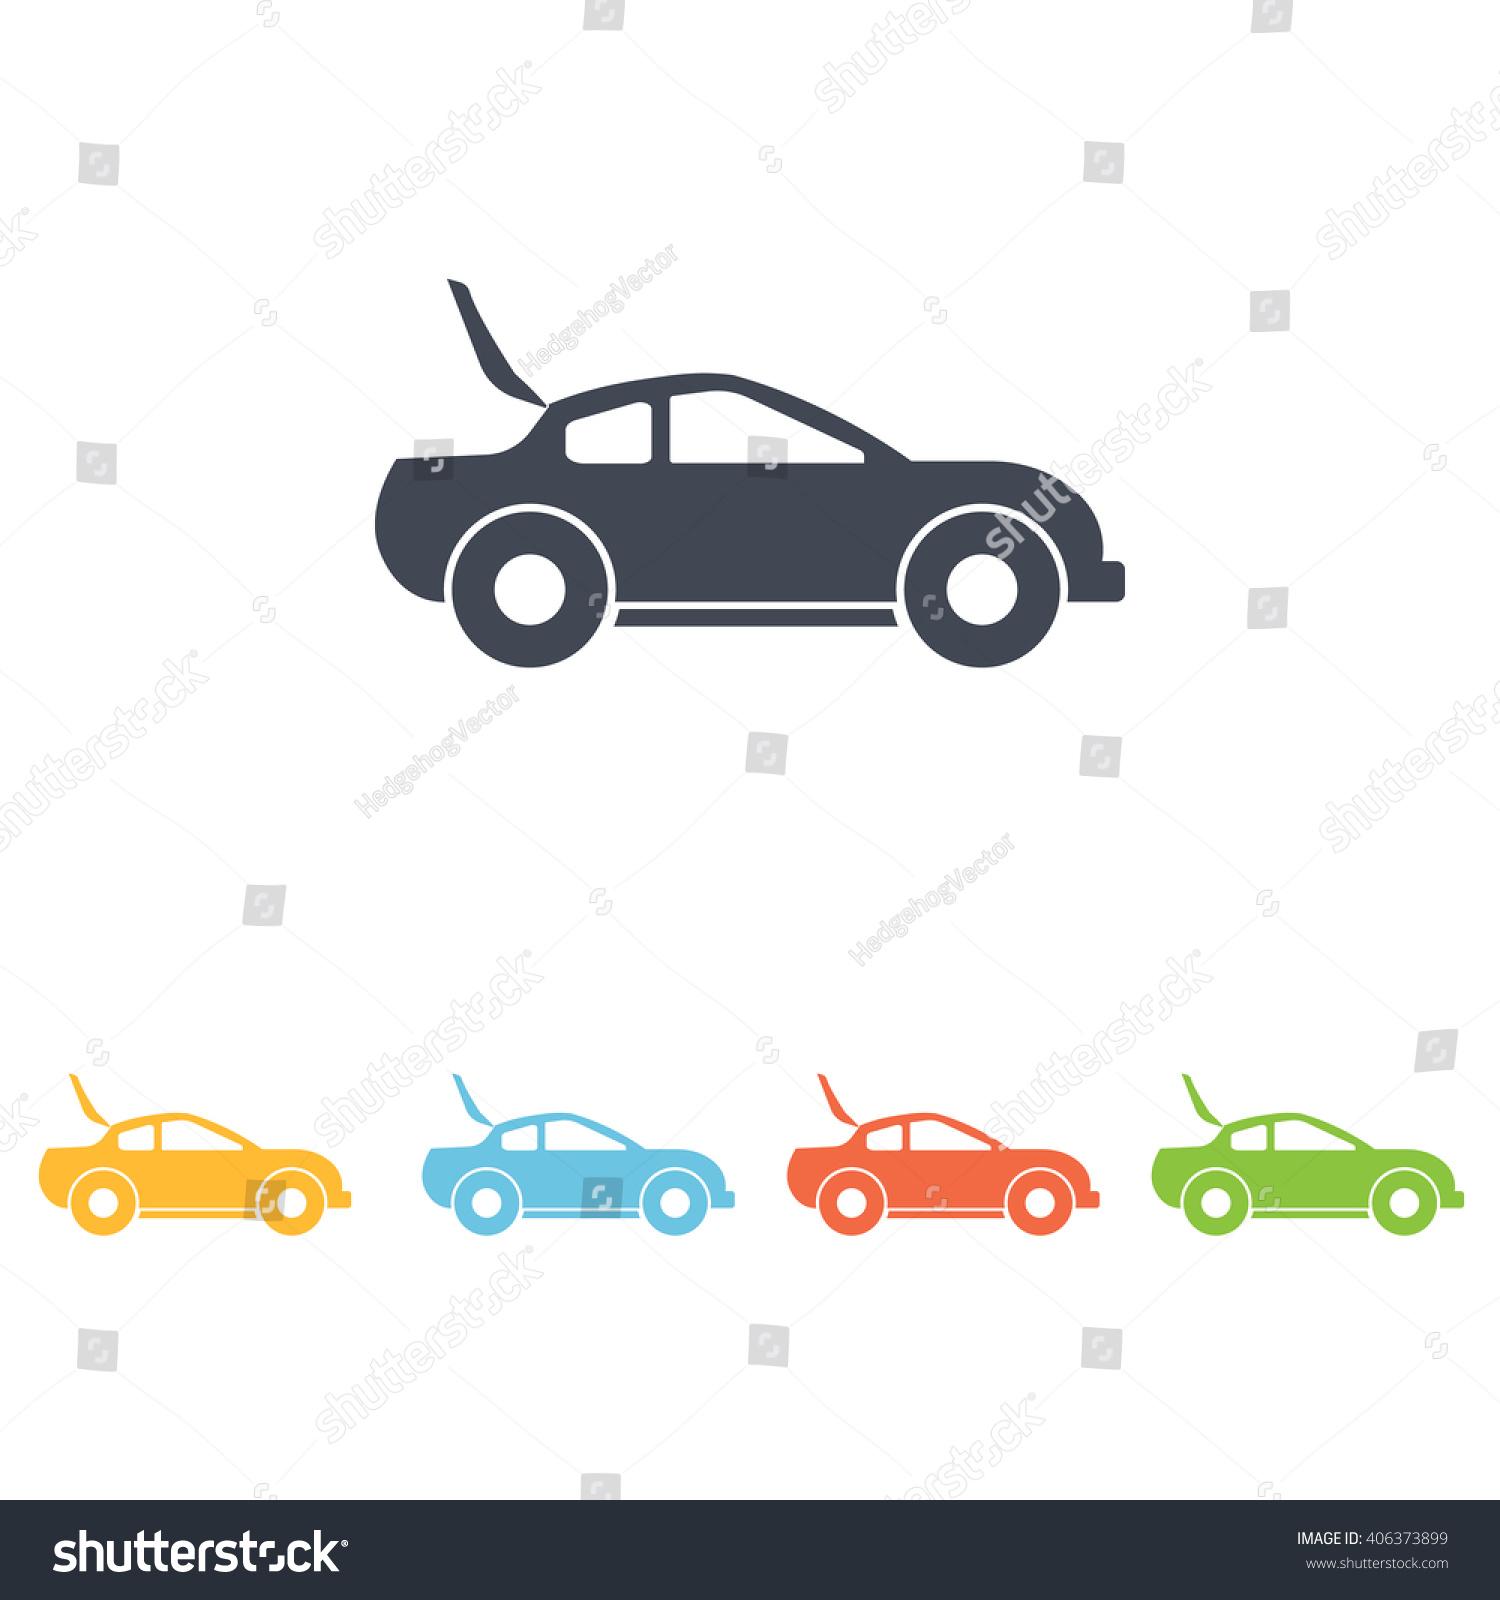 Car Open Lid Icon Stock Vector 406373899 - Shutterstock